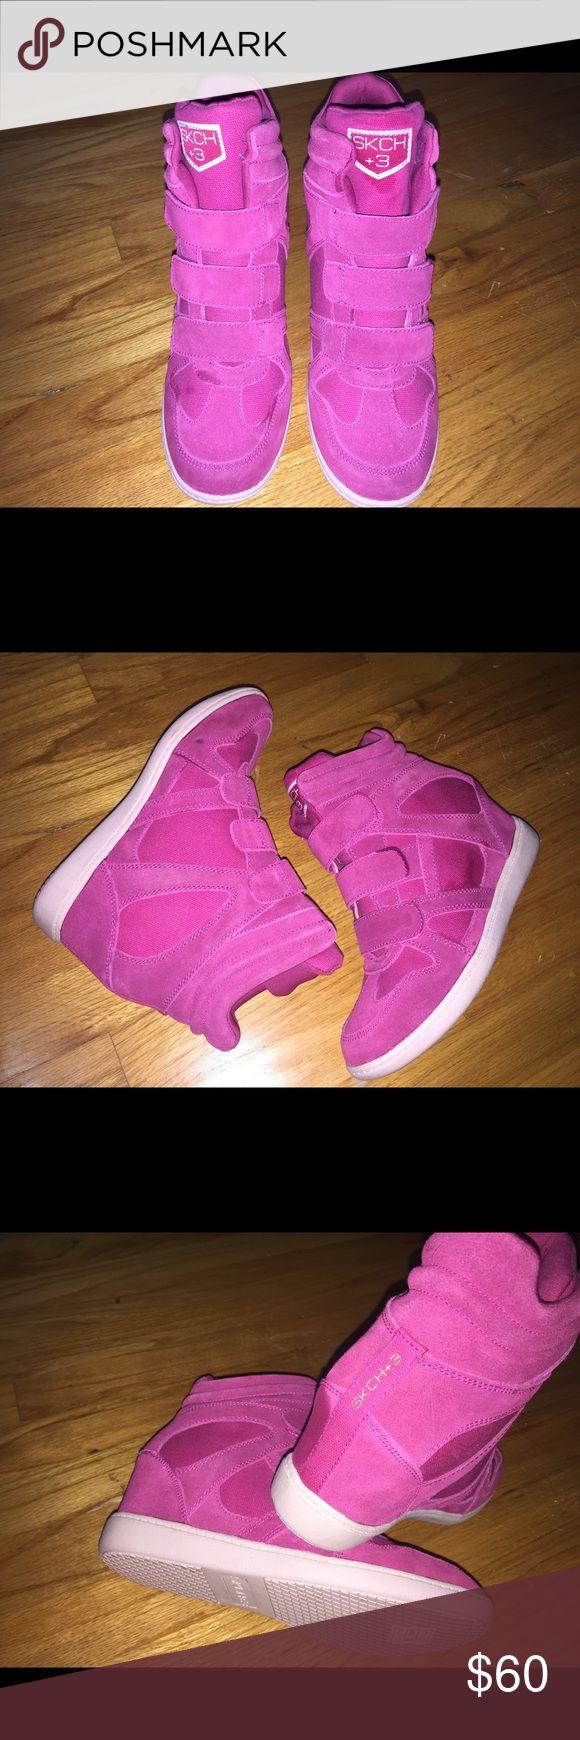 SKCH+3 wedge sneakers New!! Tagged nike for exposure Skechers Shoes Sneakers